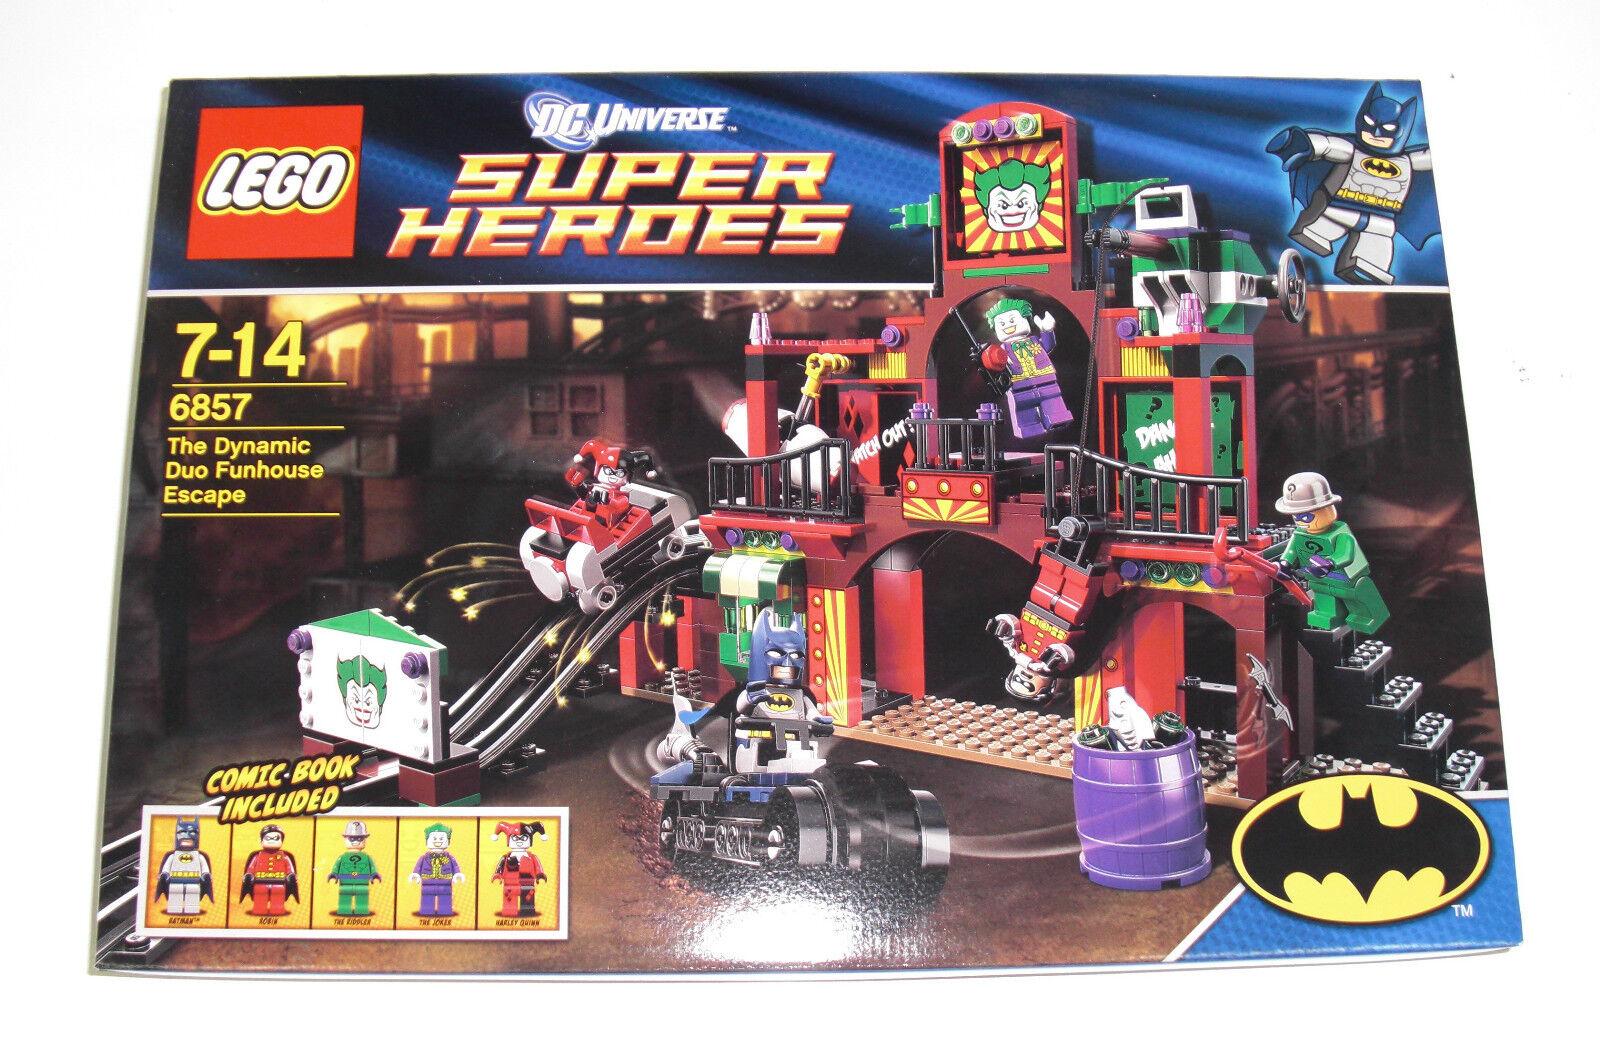 LEGO  Super Heroes 6857 - The Dynamic Duo divertimentohouse Escape - NEU DC Batuomo MISB  Sconto del 70%